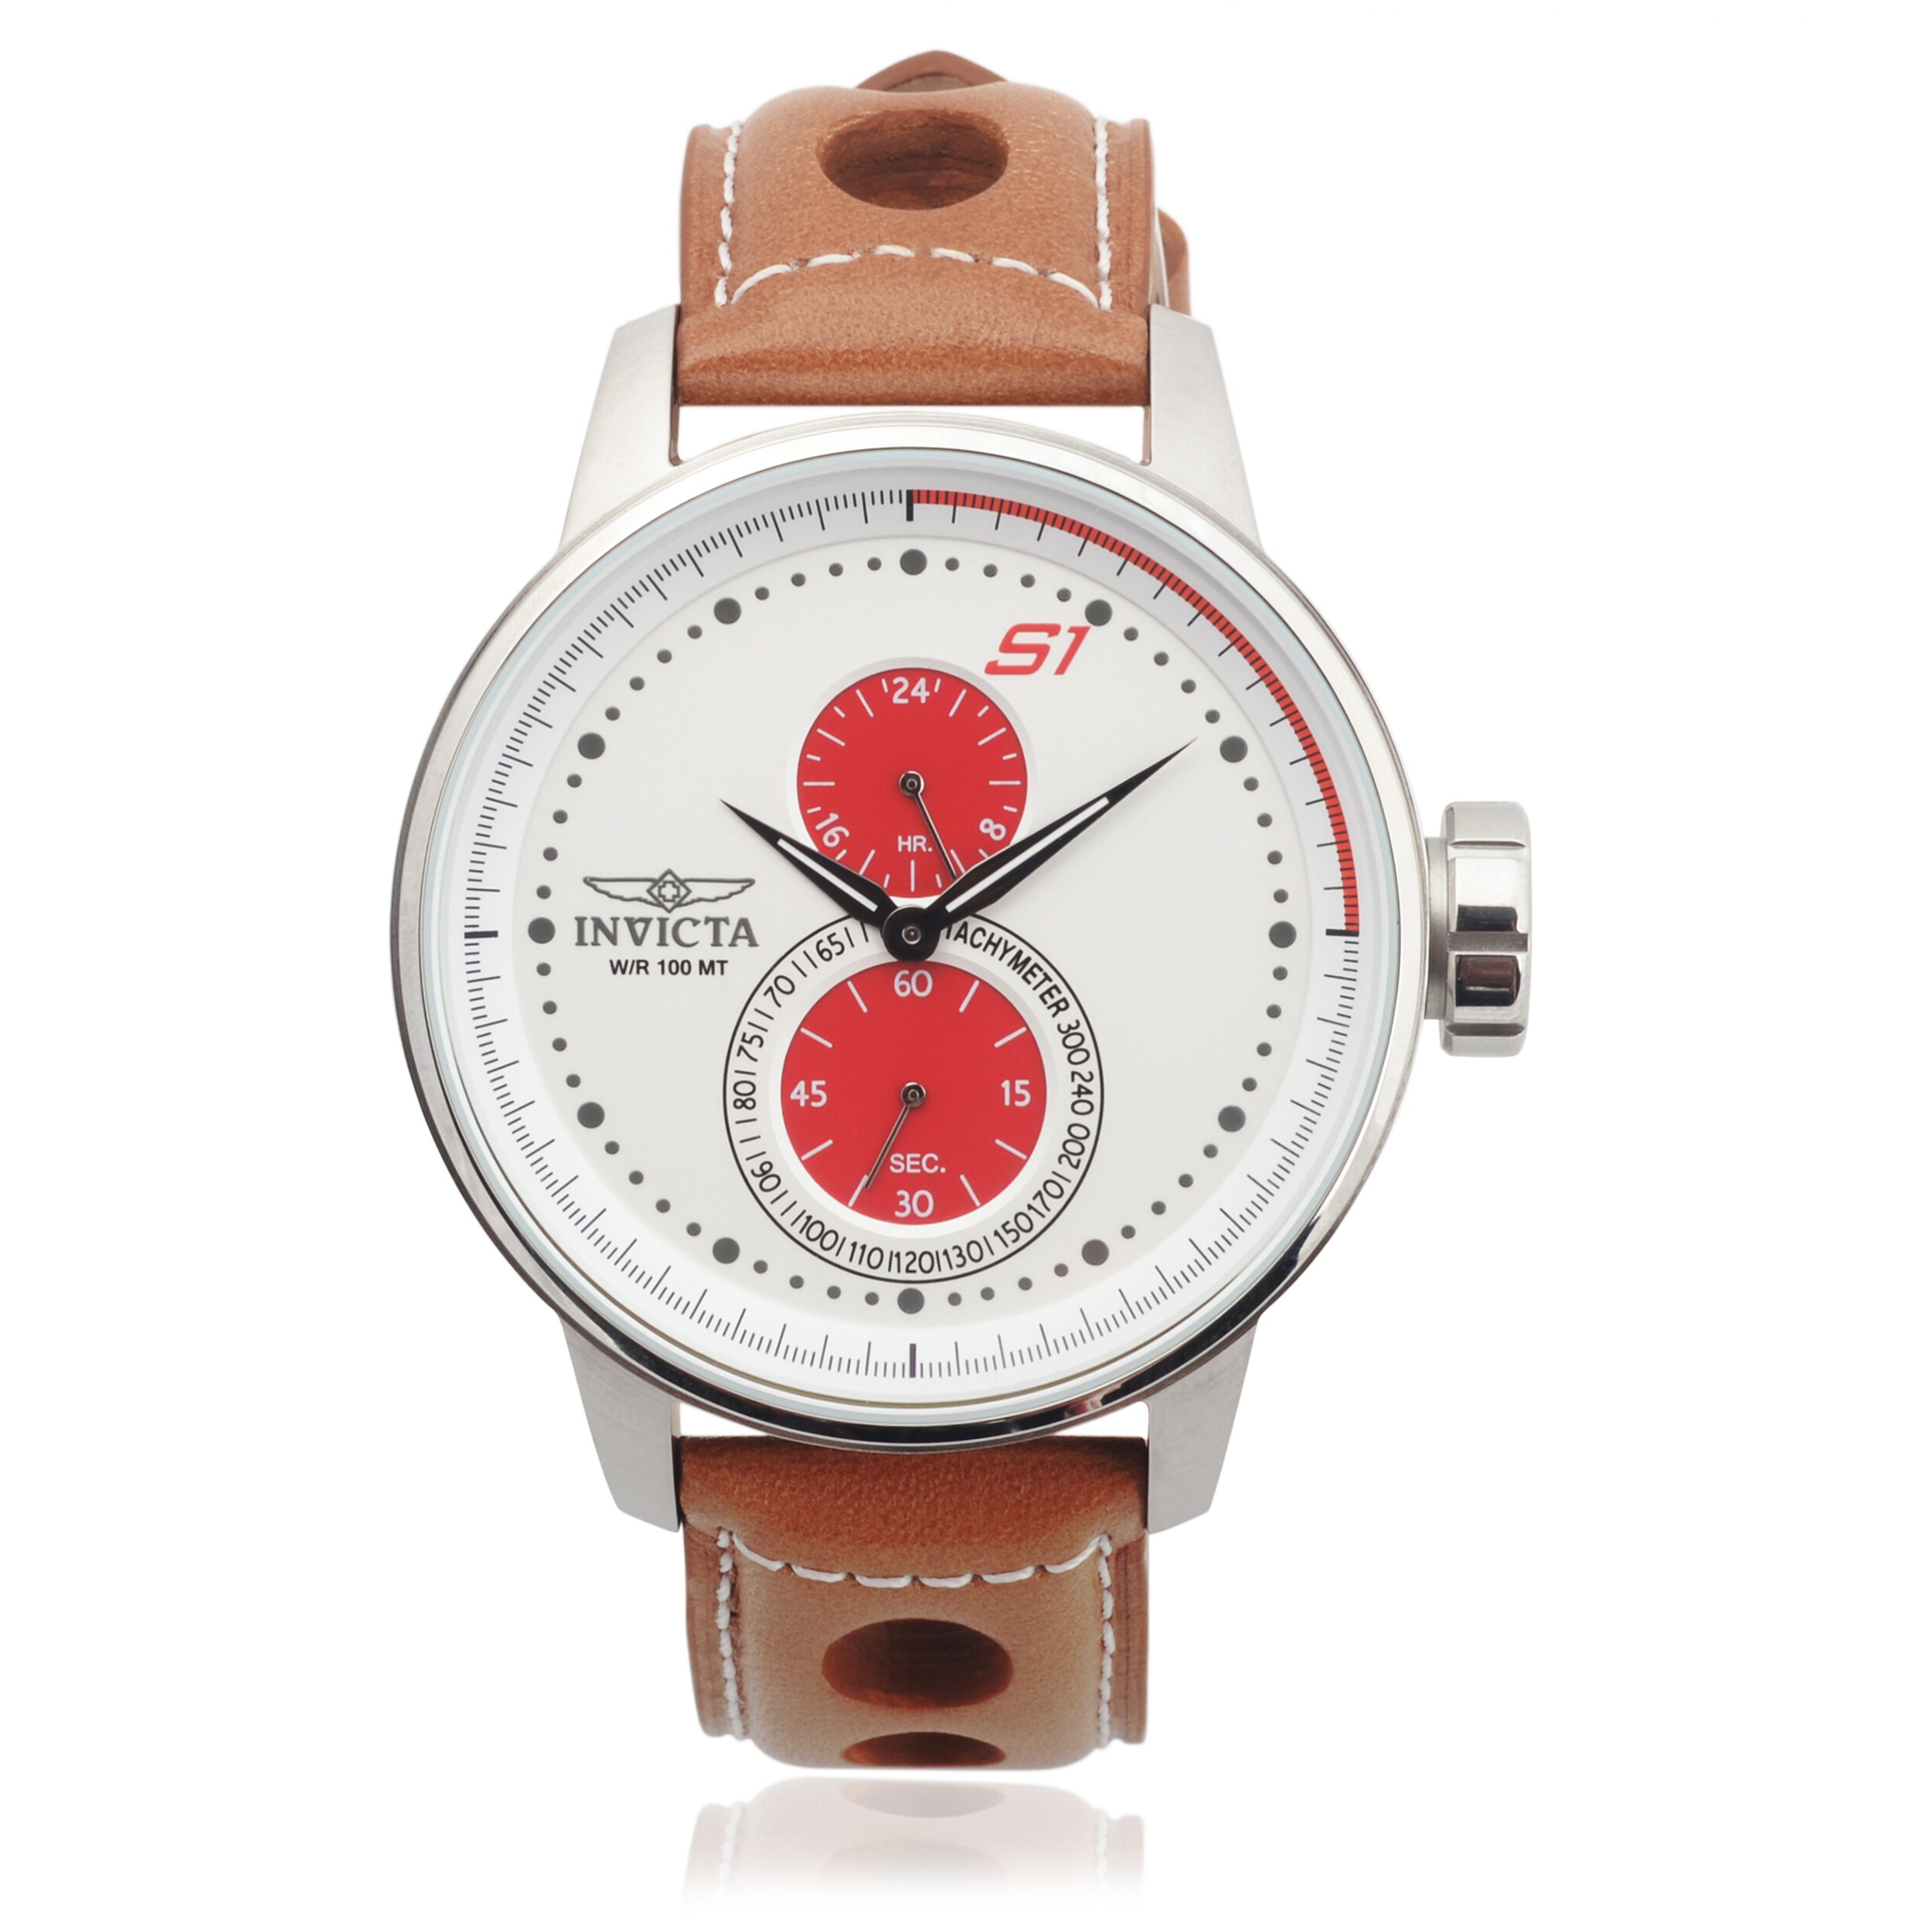 Invicta Men's 16018 Genuine Leather 'Rally' Quartz Watch